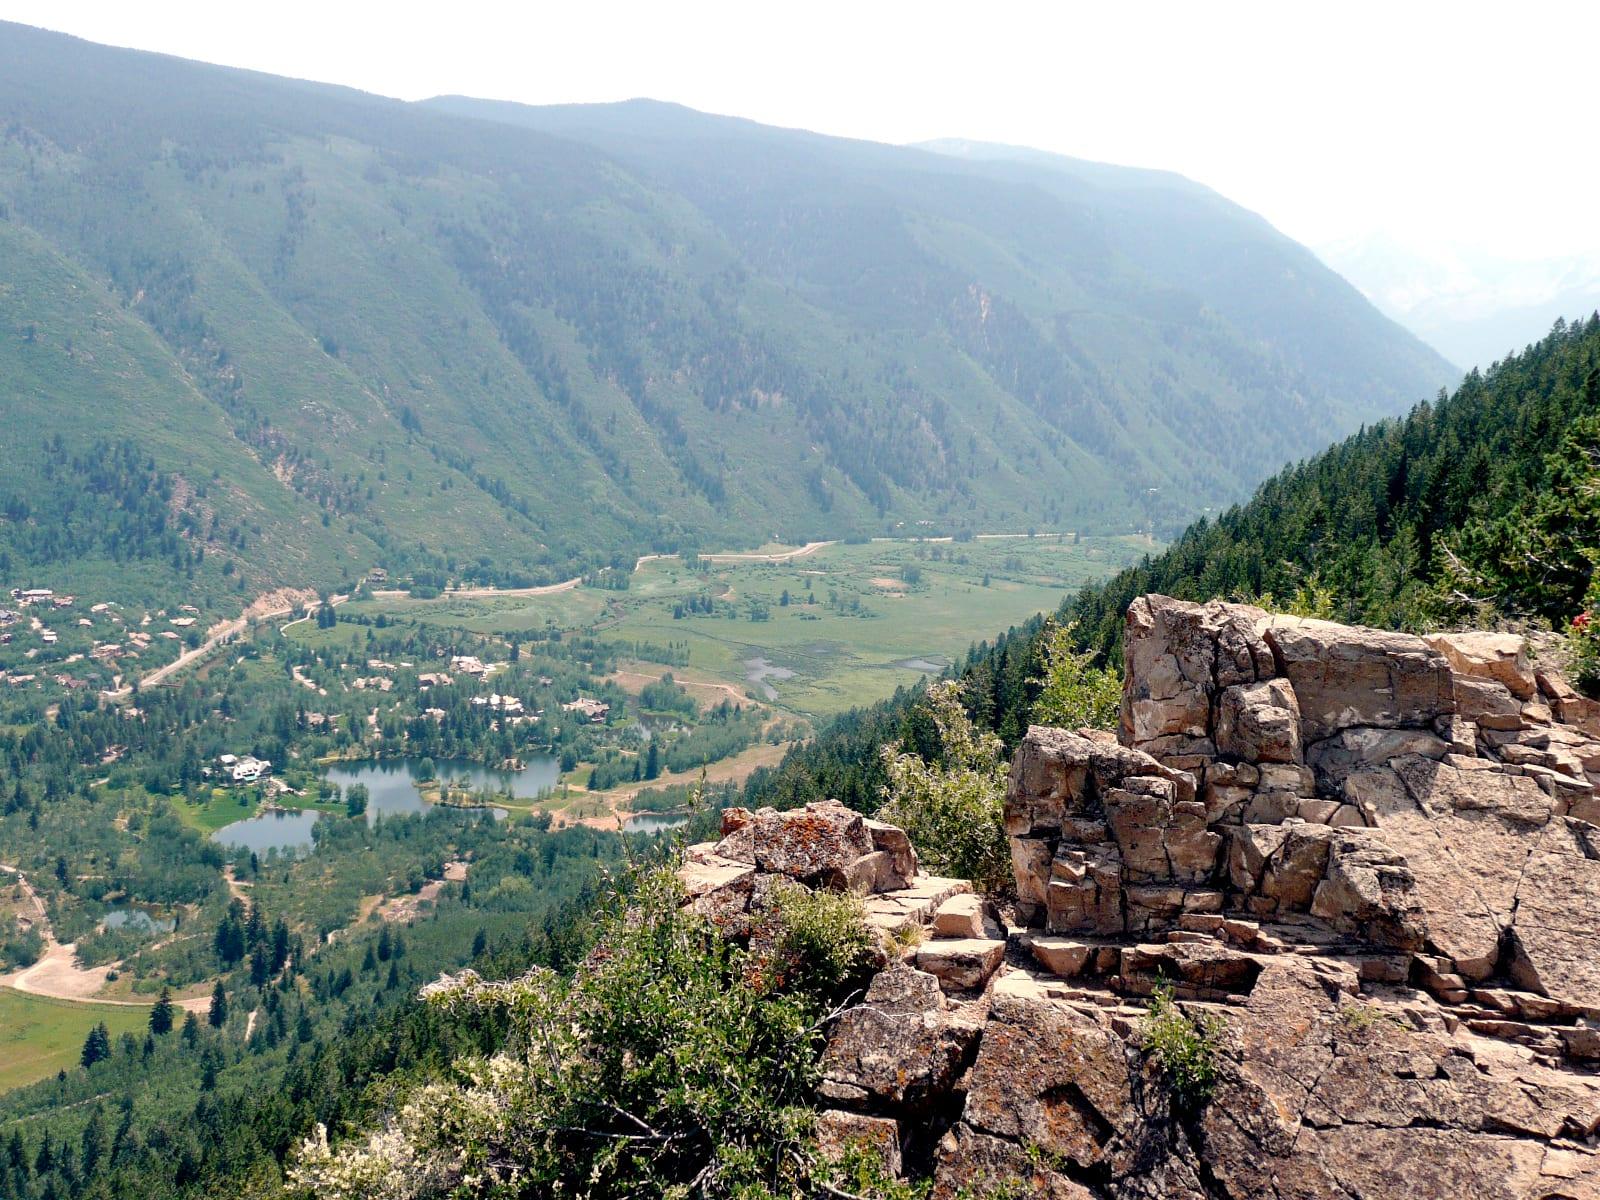 Top Hikes Ute Trail Summit Overlook Aspen Colorado